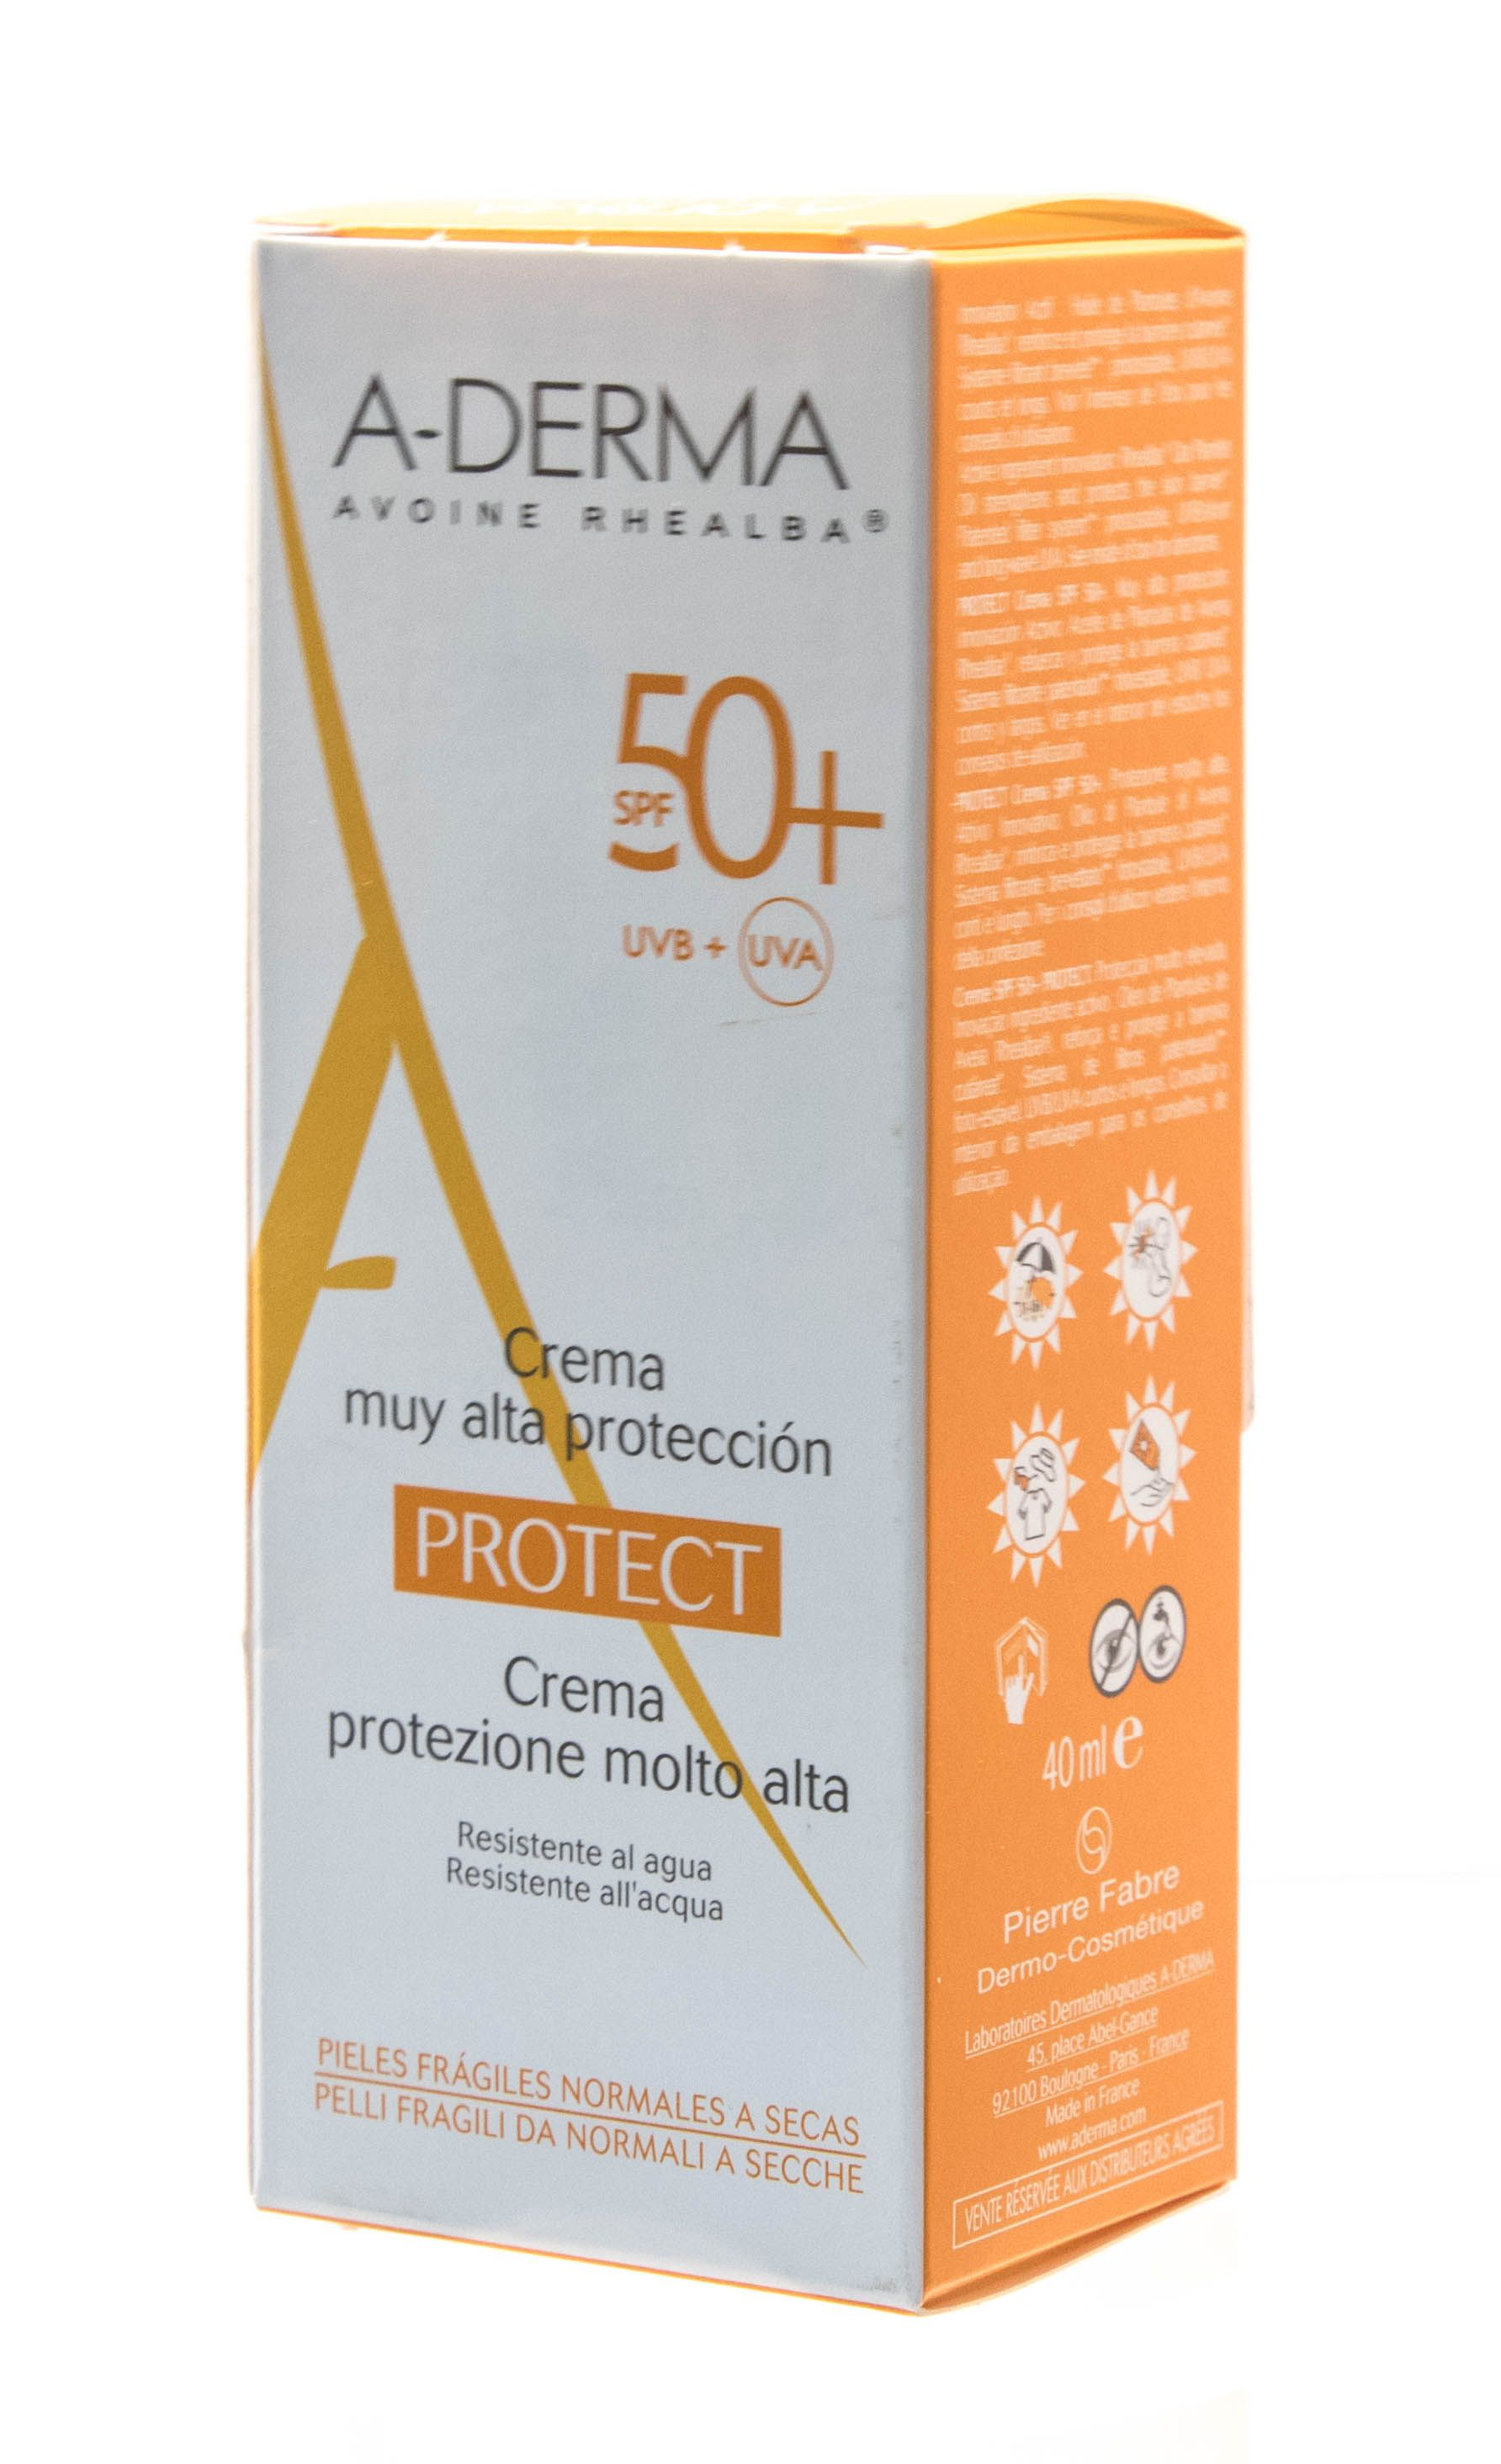 фото упаковки A-Derma Protect Крем солнцезащитный SPF 50+